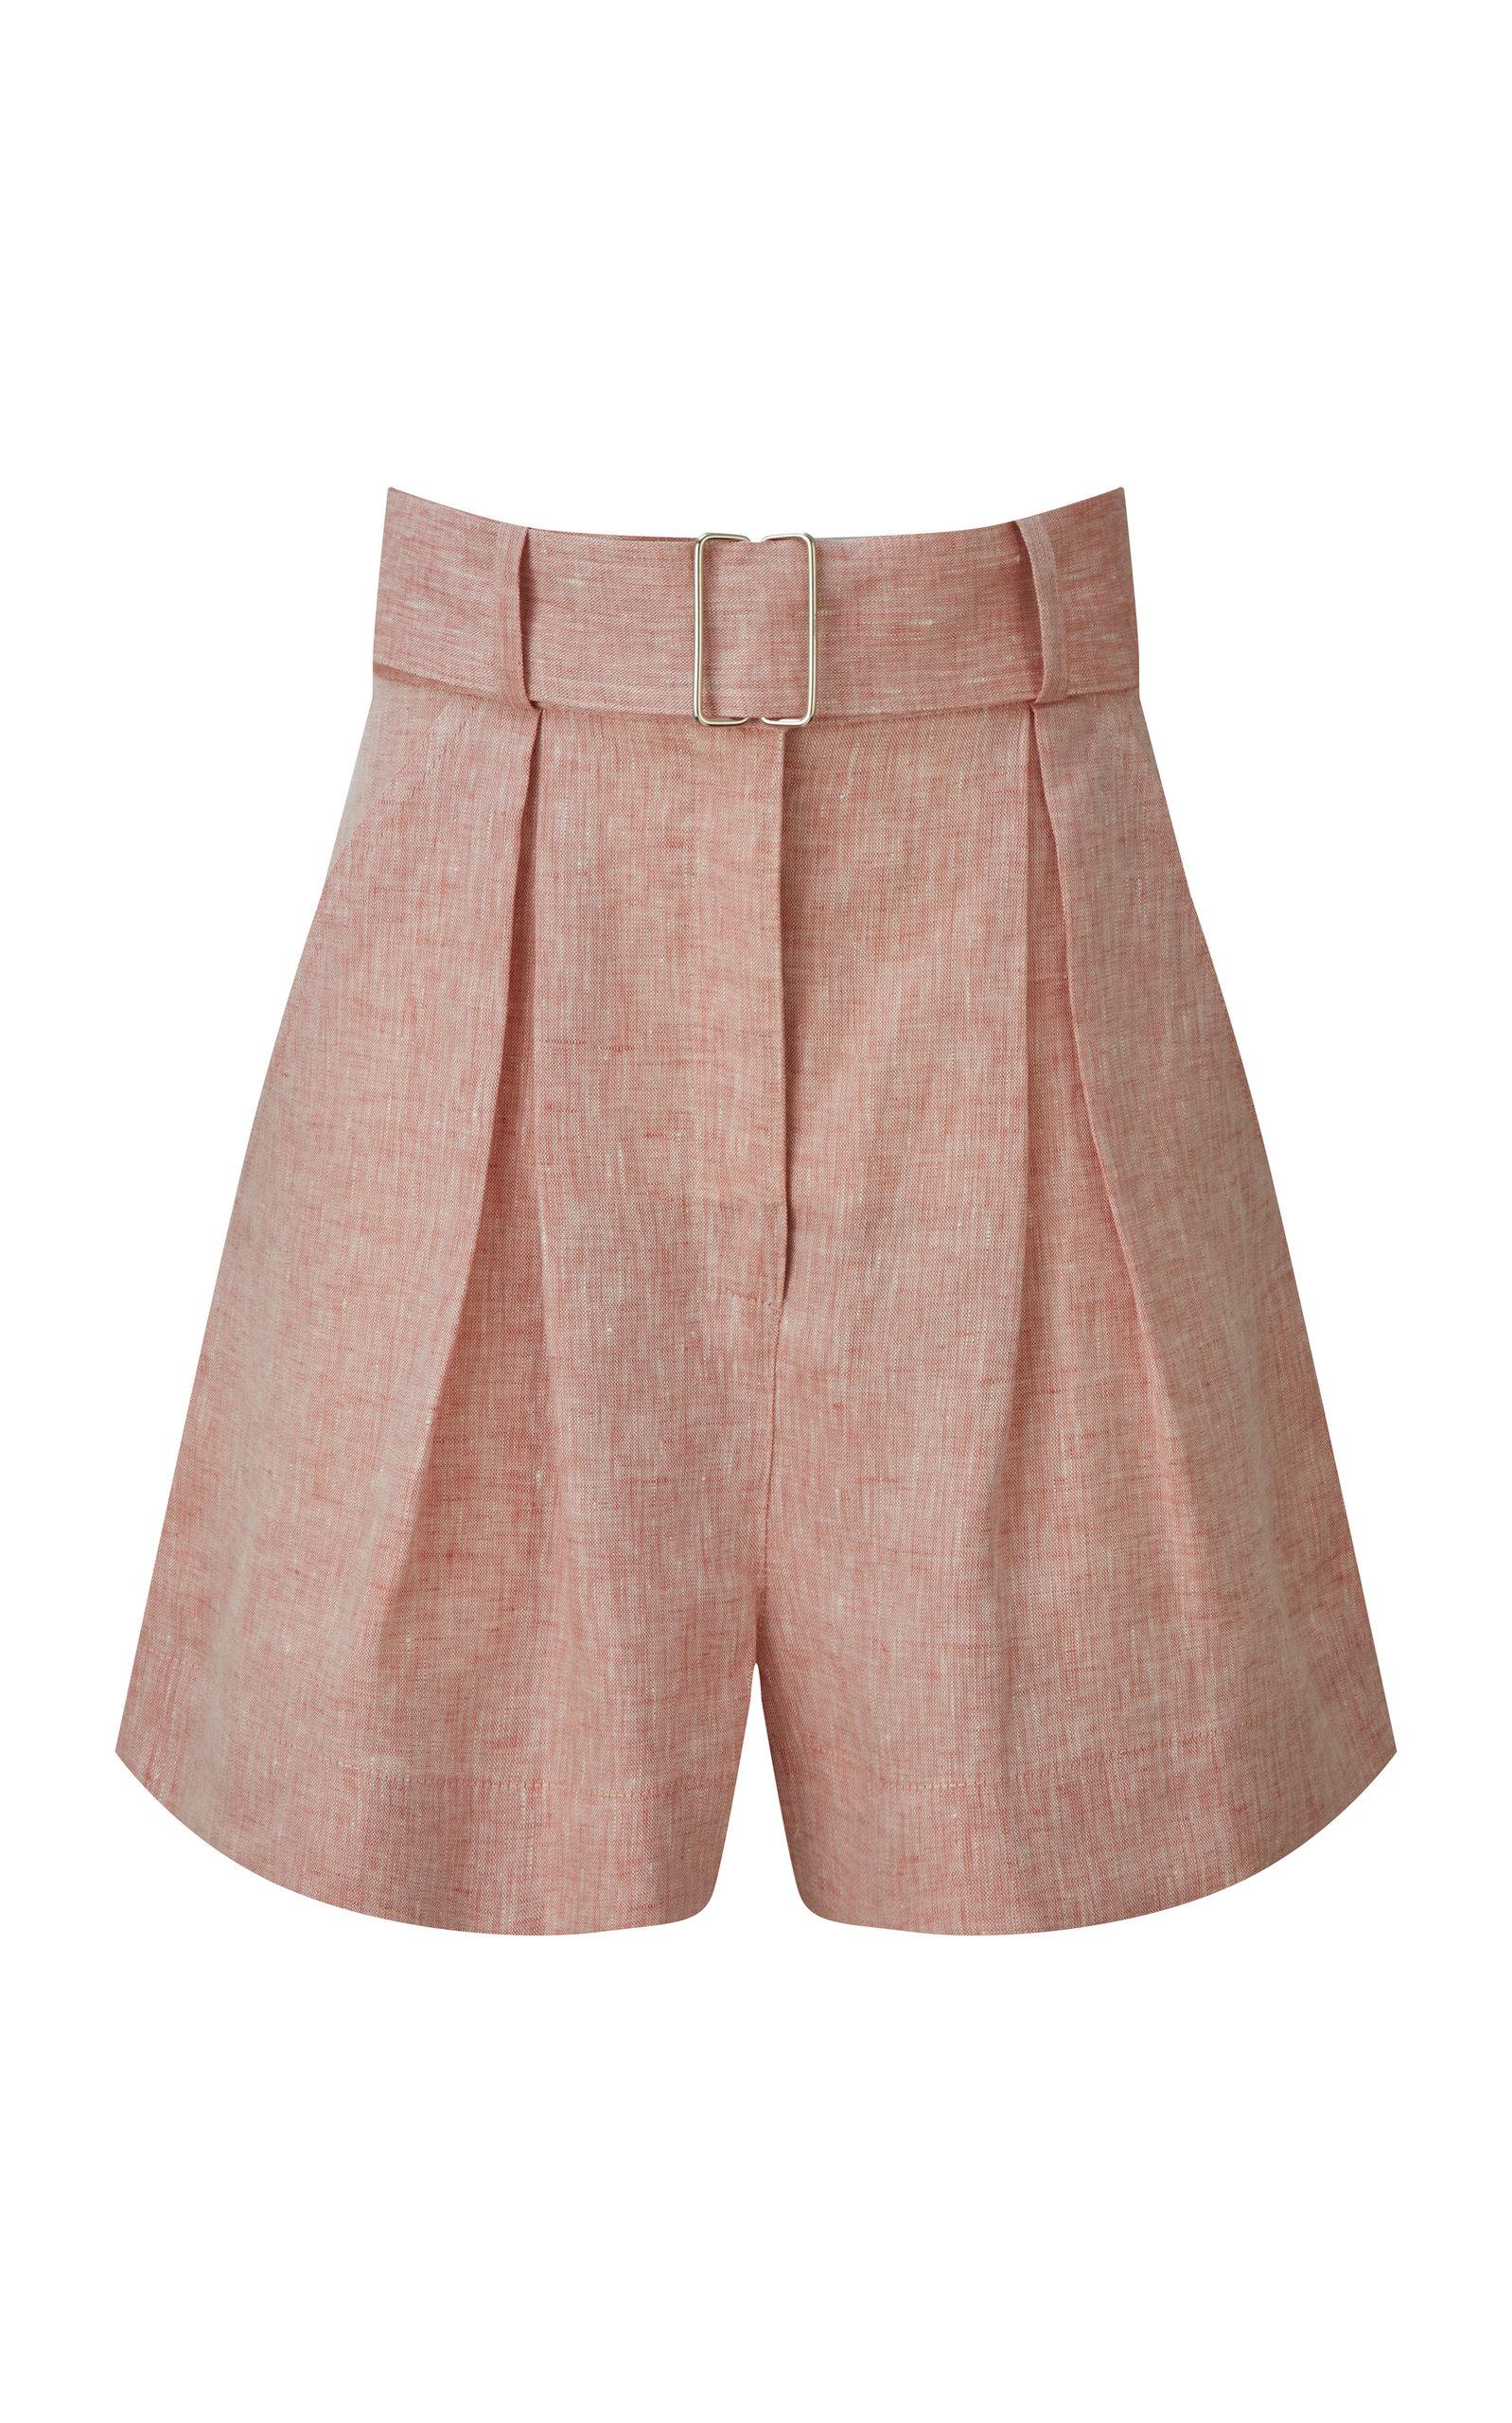 Women's Pleated Linen Shorts